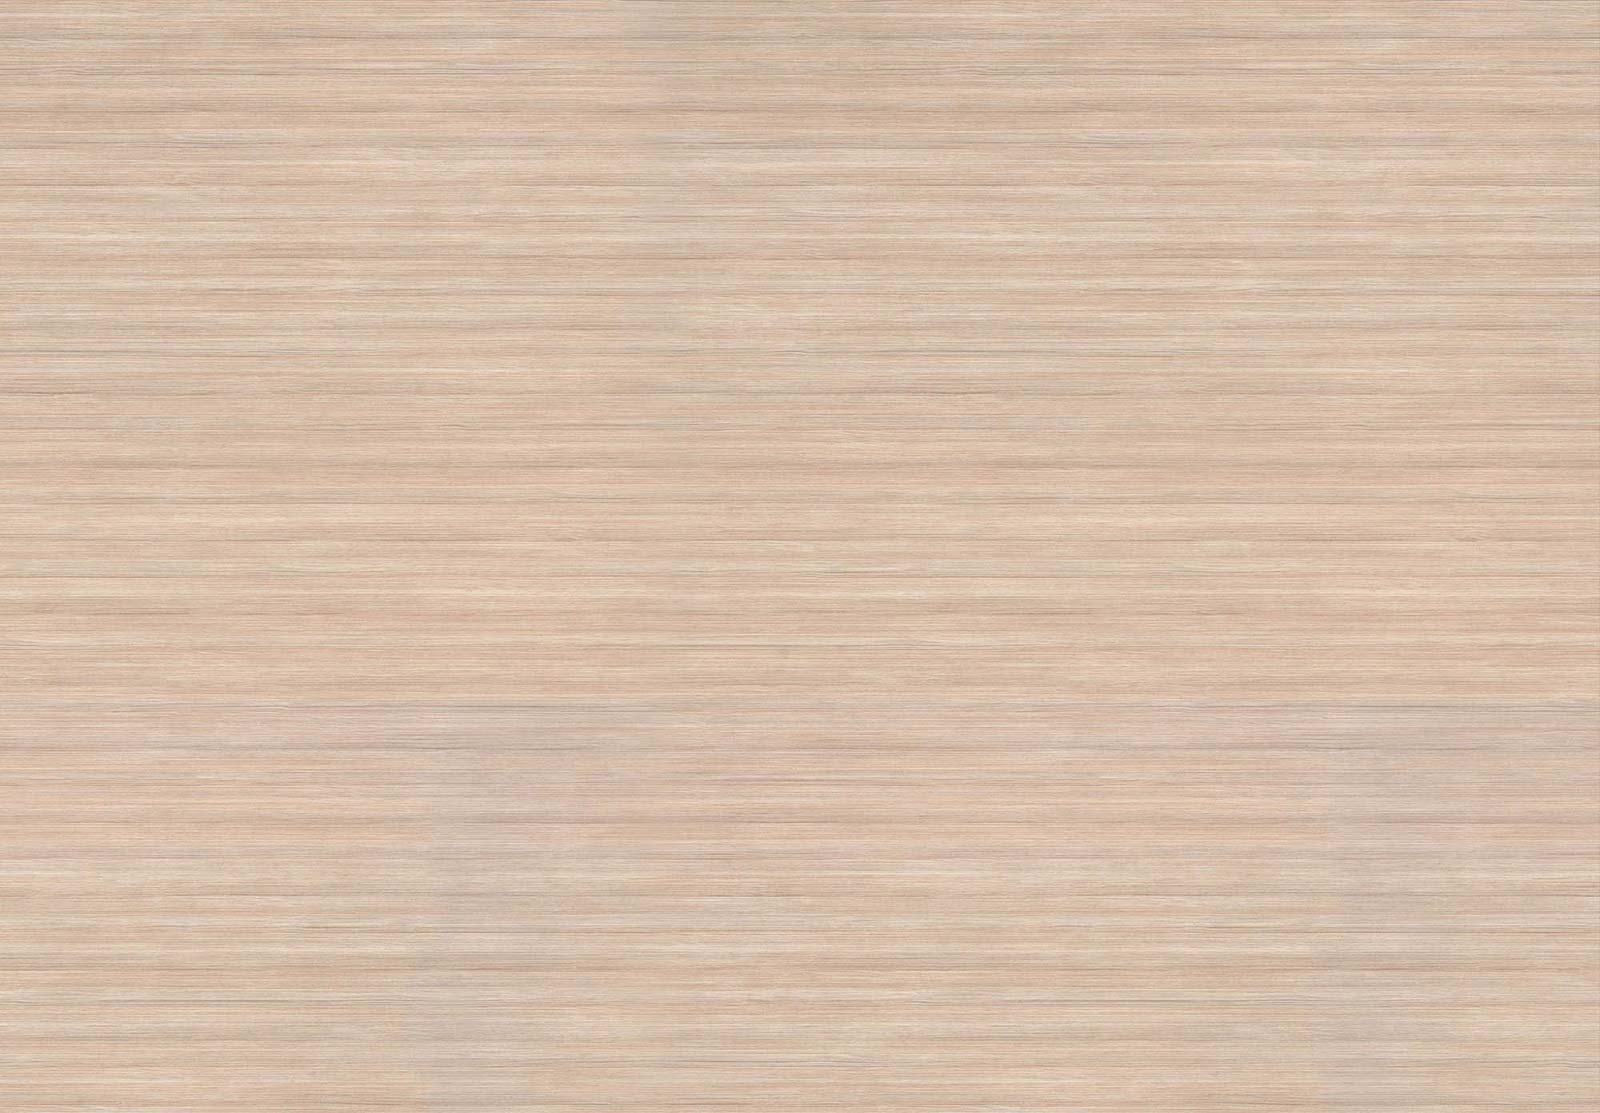 Pannelli alfawood - Pino Riga 0201